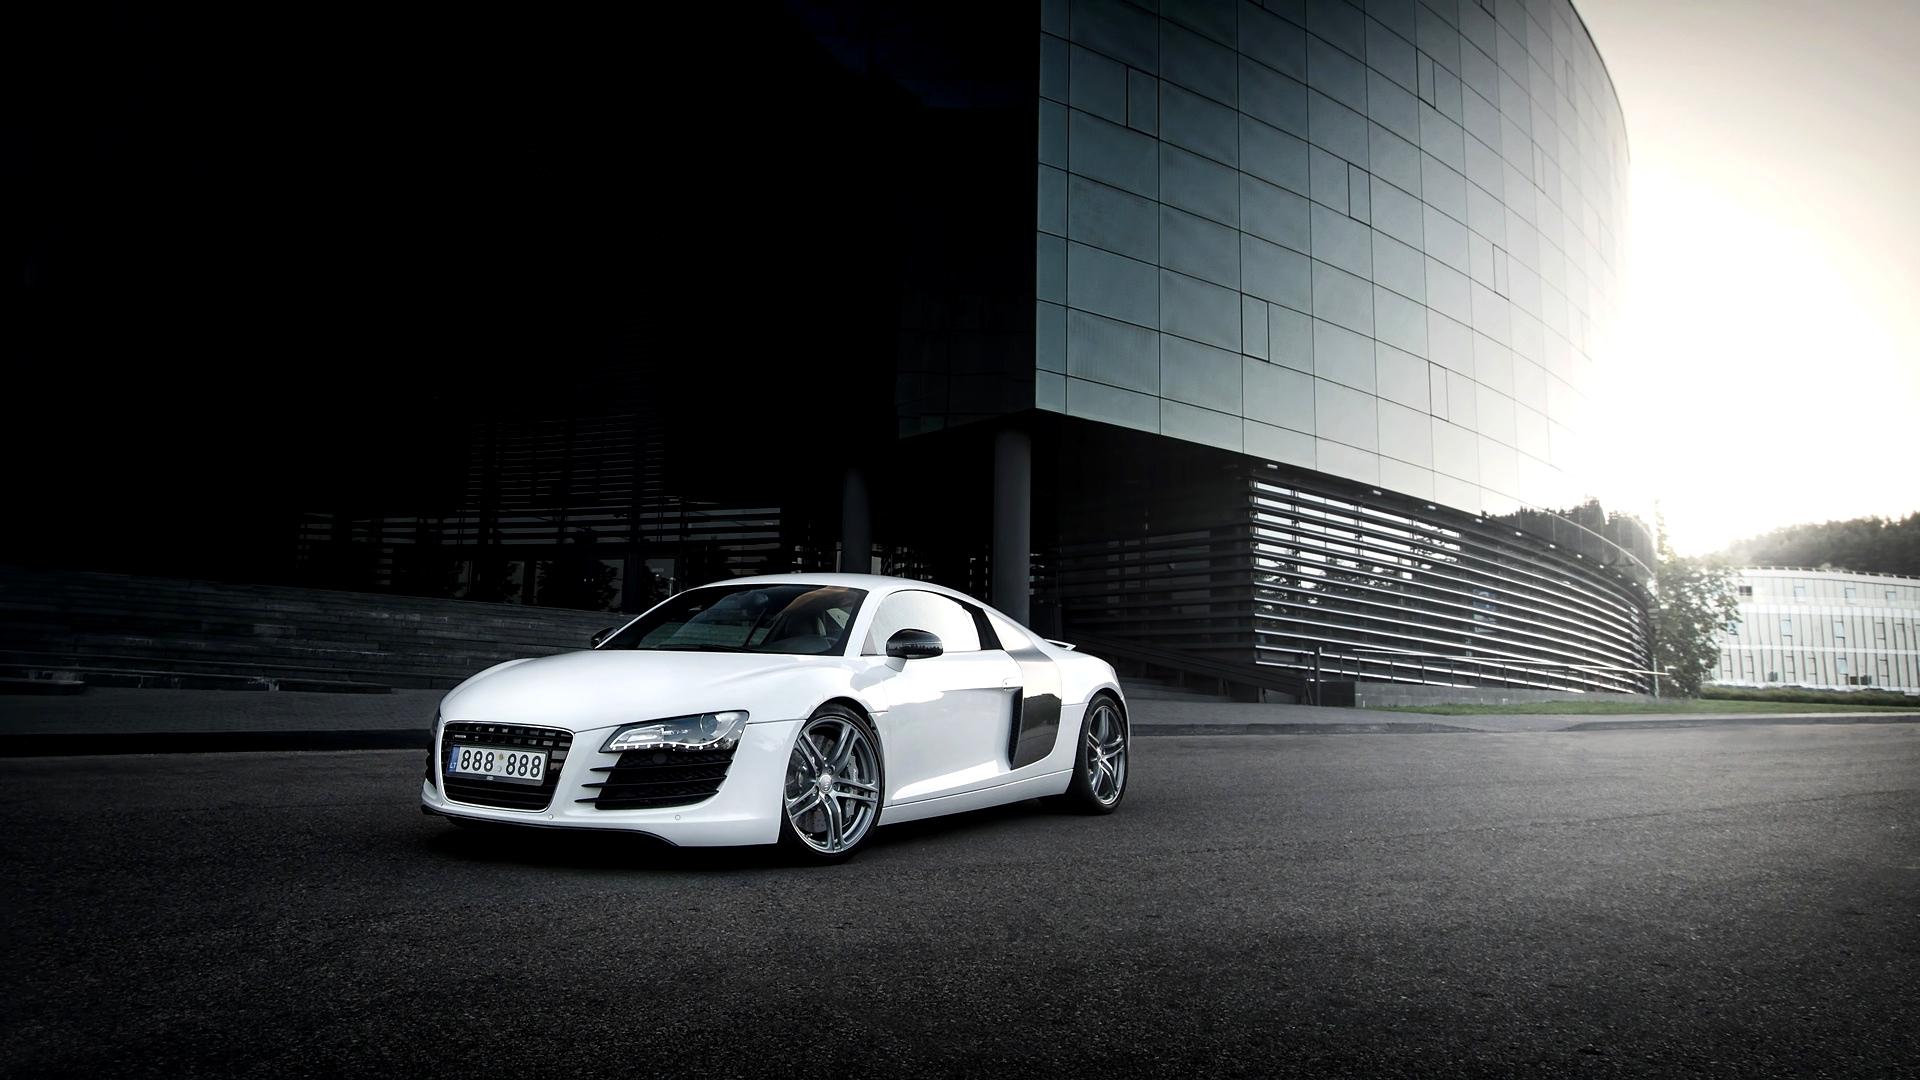 Audi R8 White Building